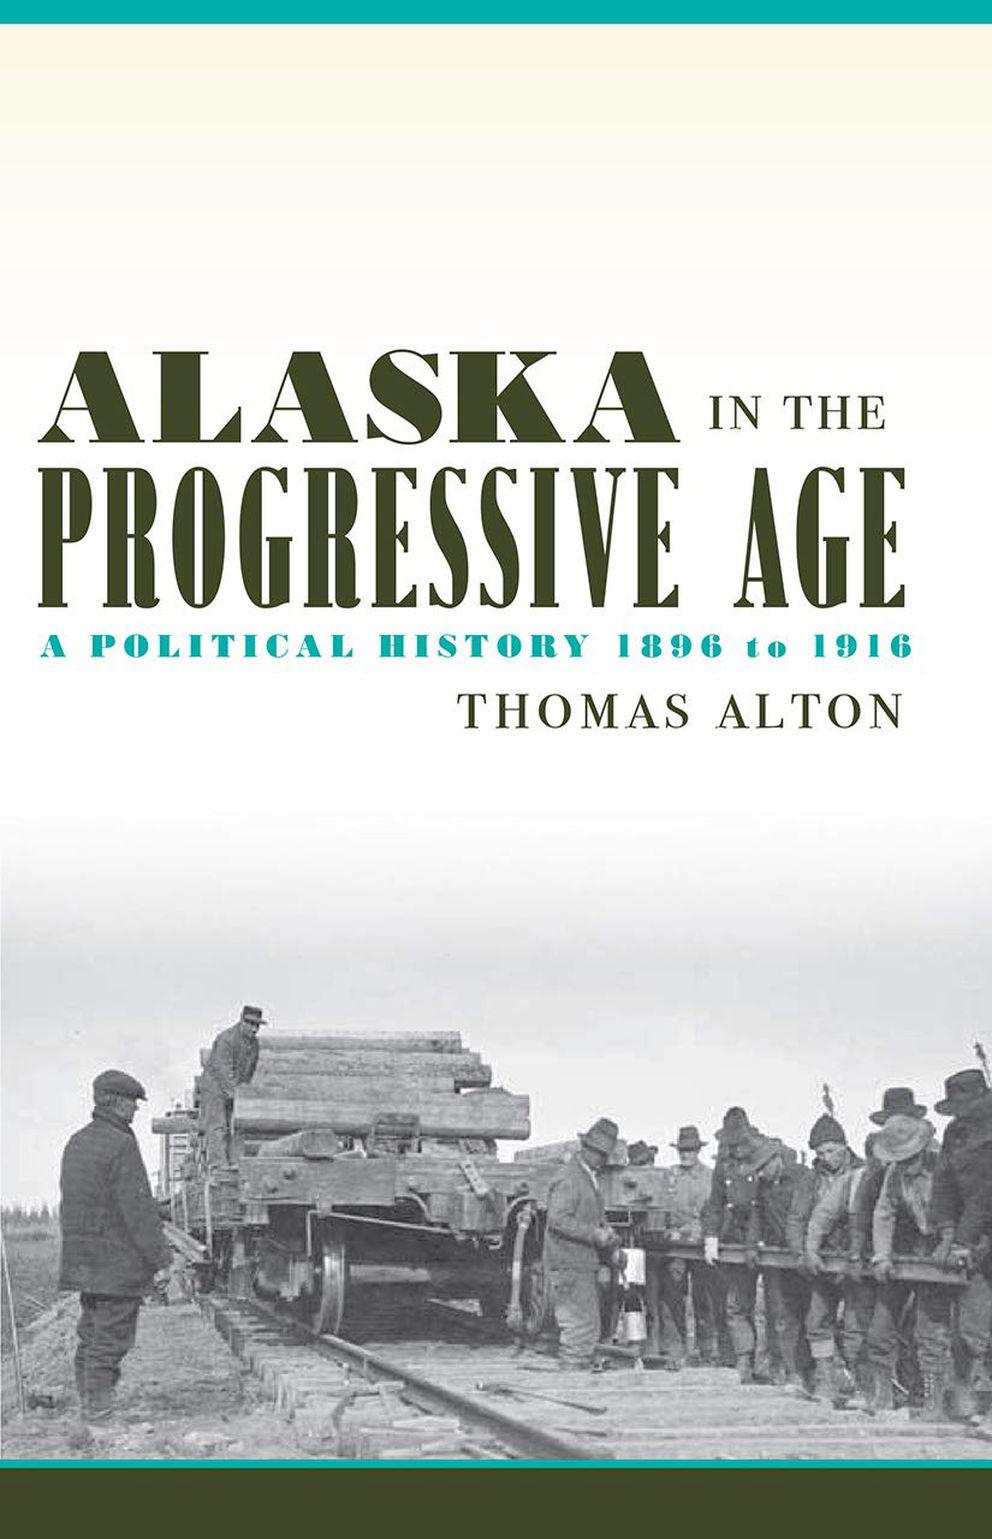 'Alaska in the Progressive Age: A Political History 1896 to 1916, ' by Thomas Alton